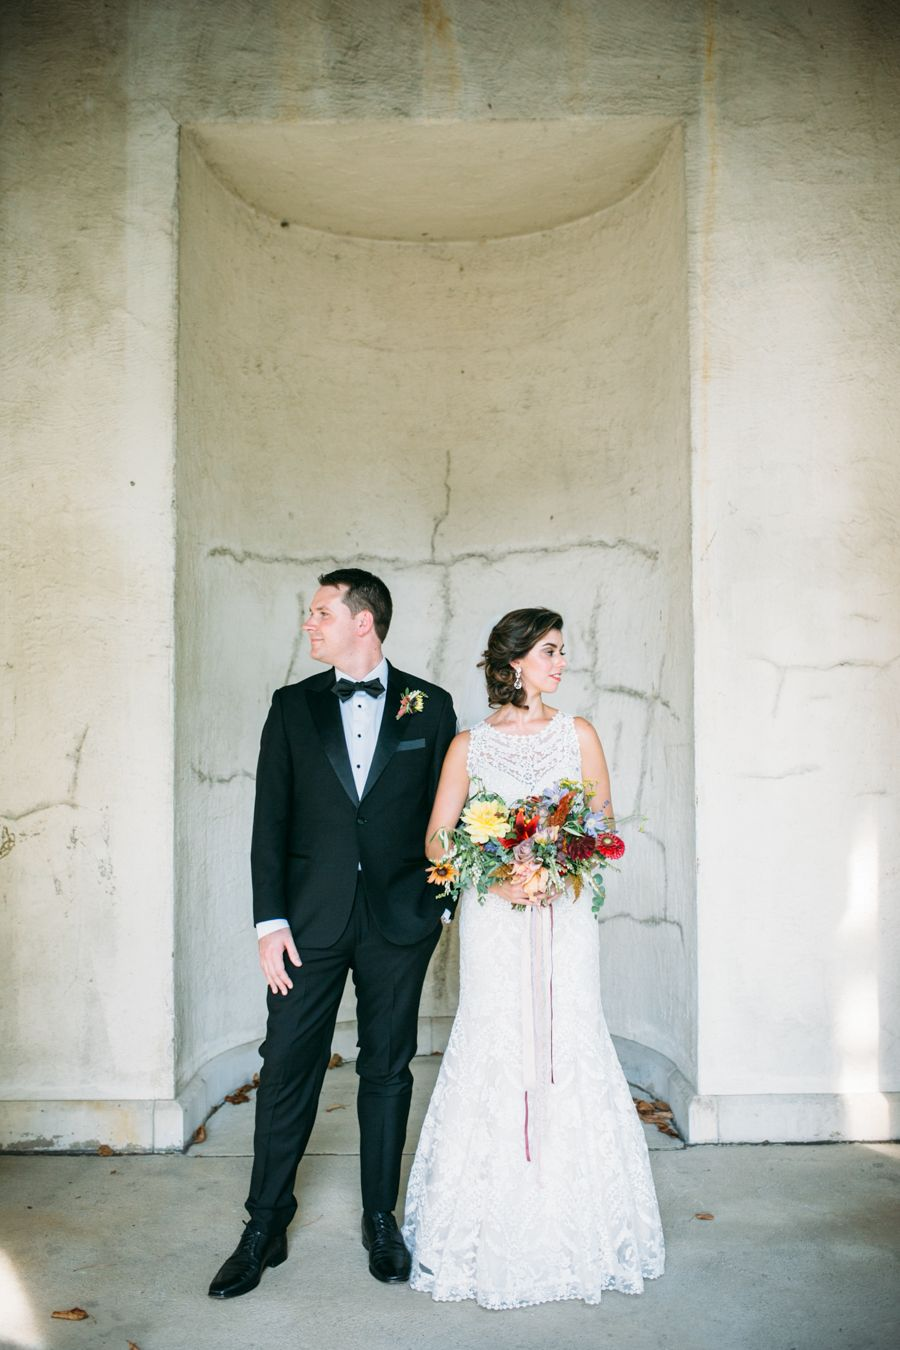 Mediterranean wedding at the american swedish historical museum